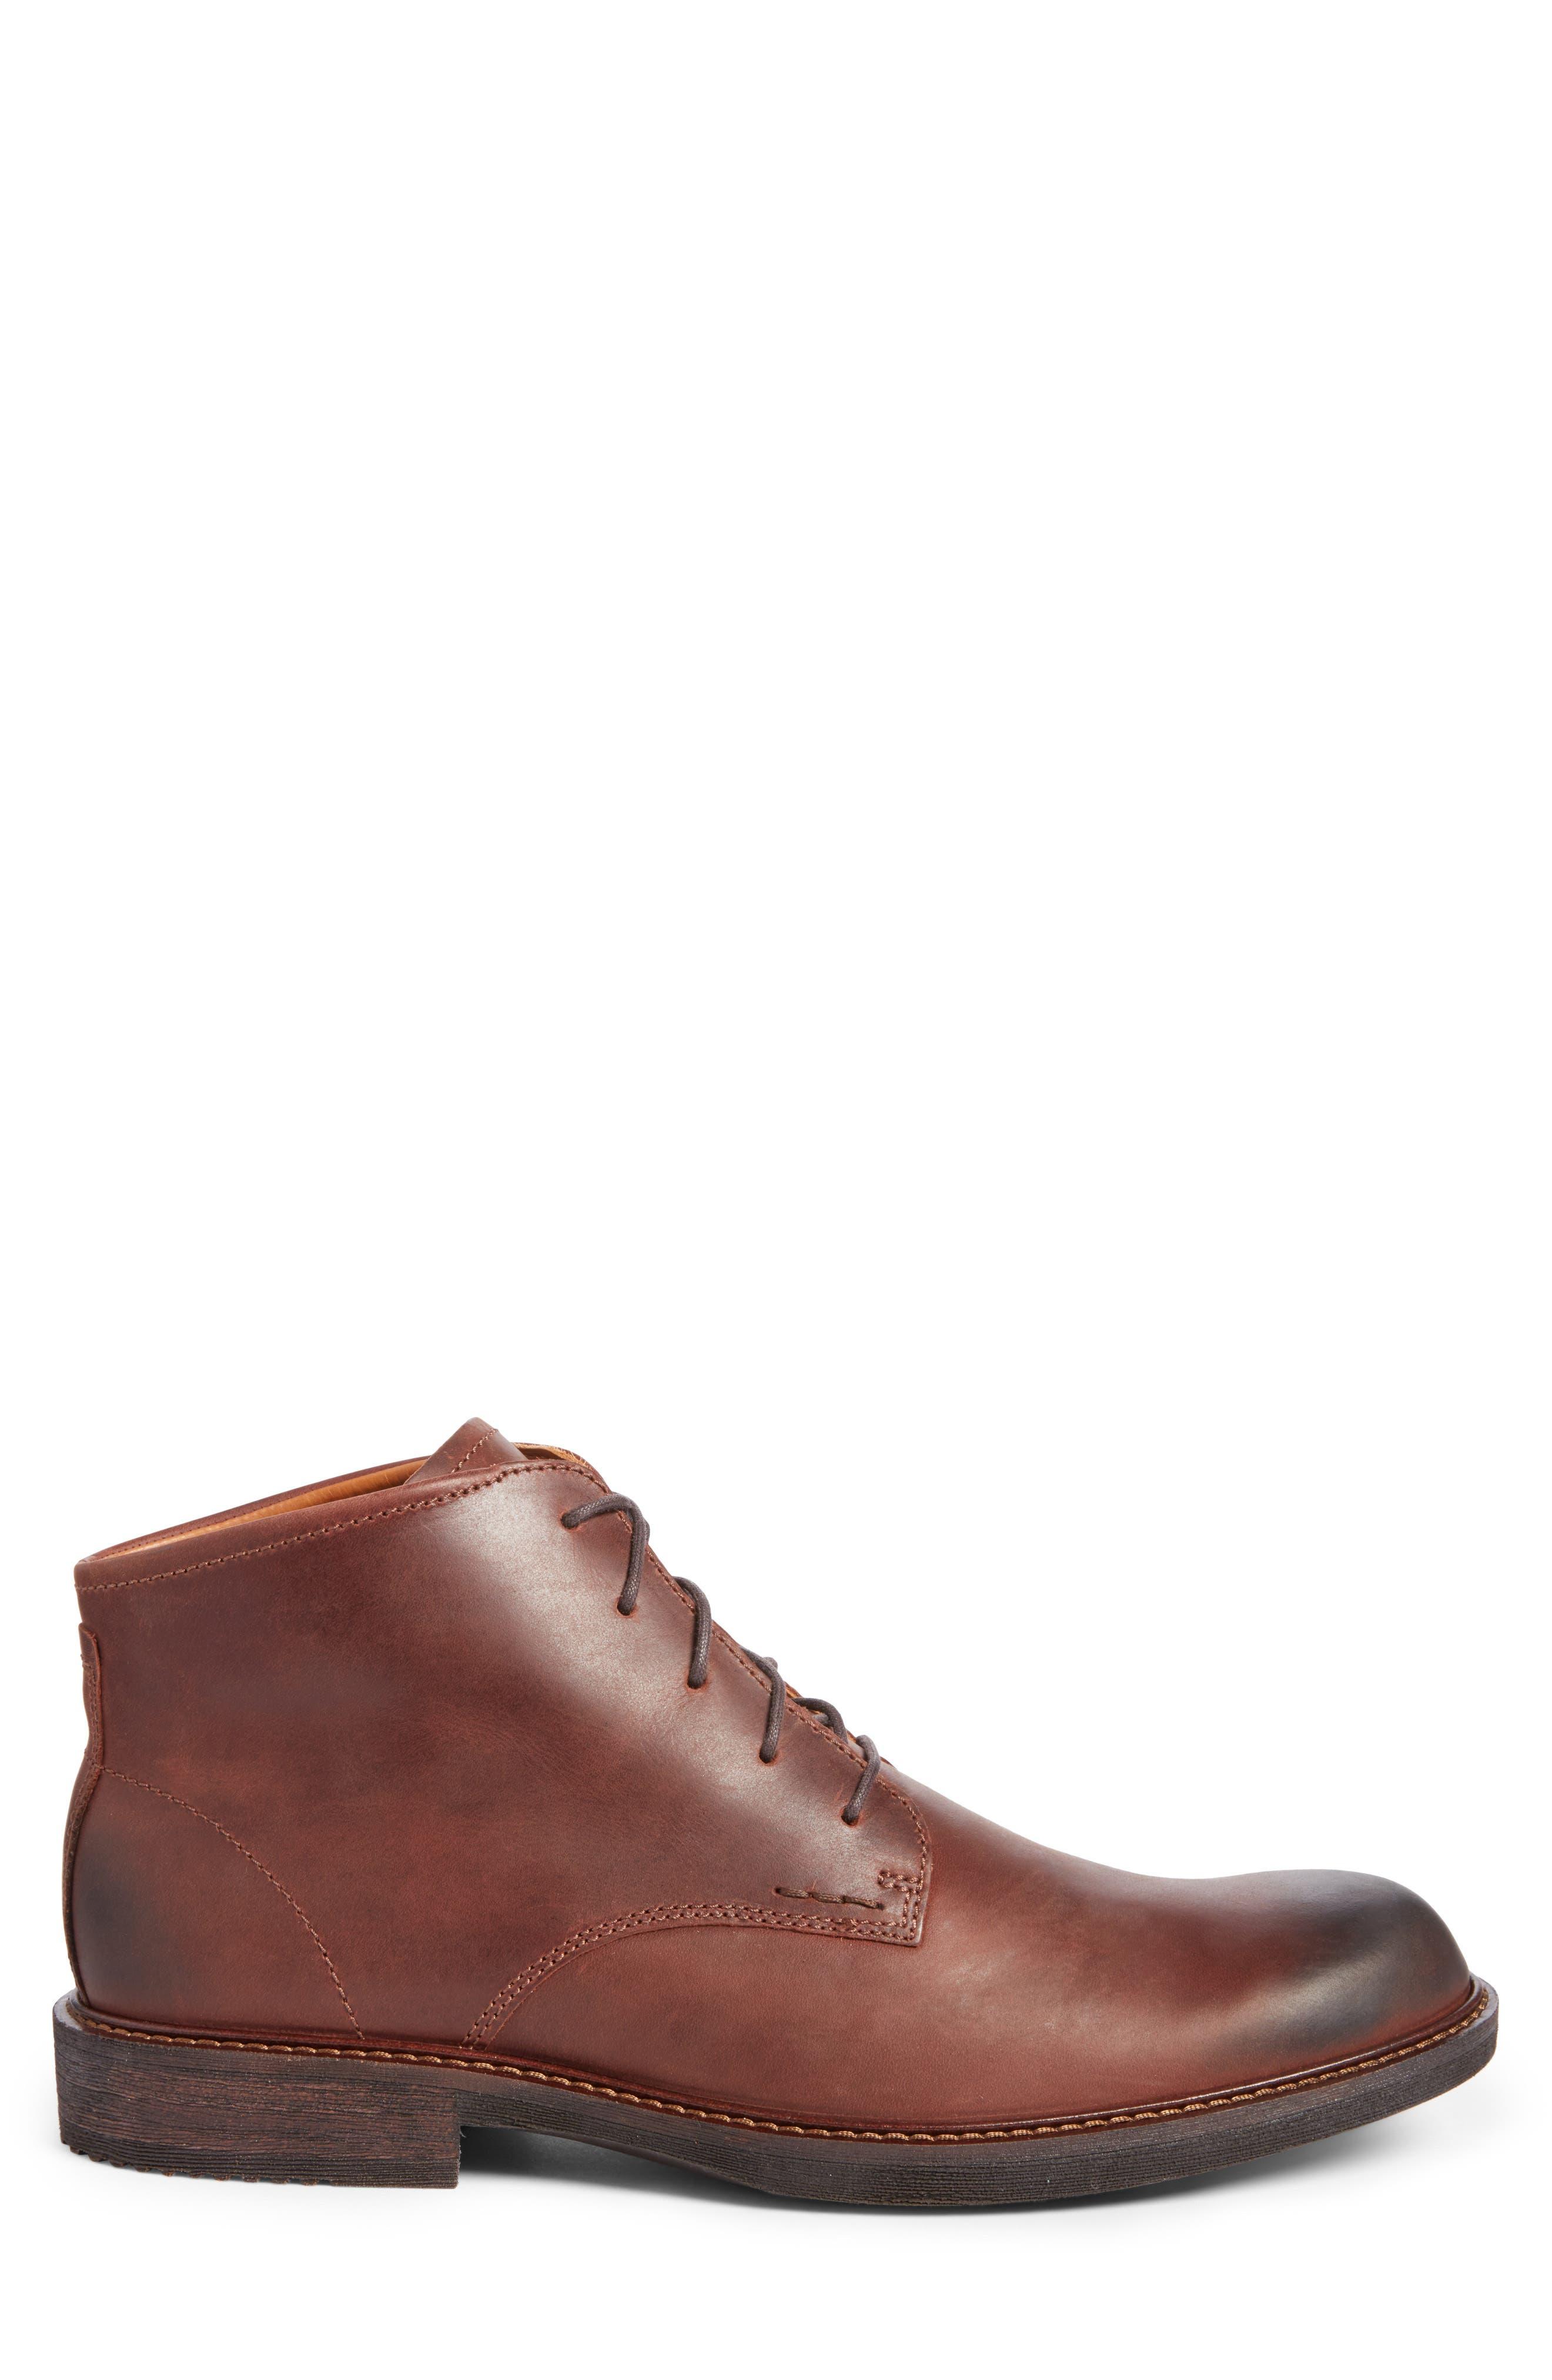 Alternate Image 3  - ECCO 'Kenton' Plain Toe Boot (Men)